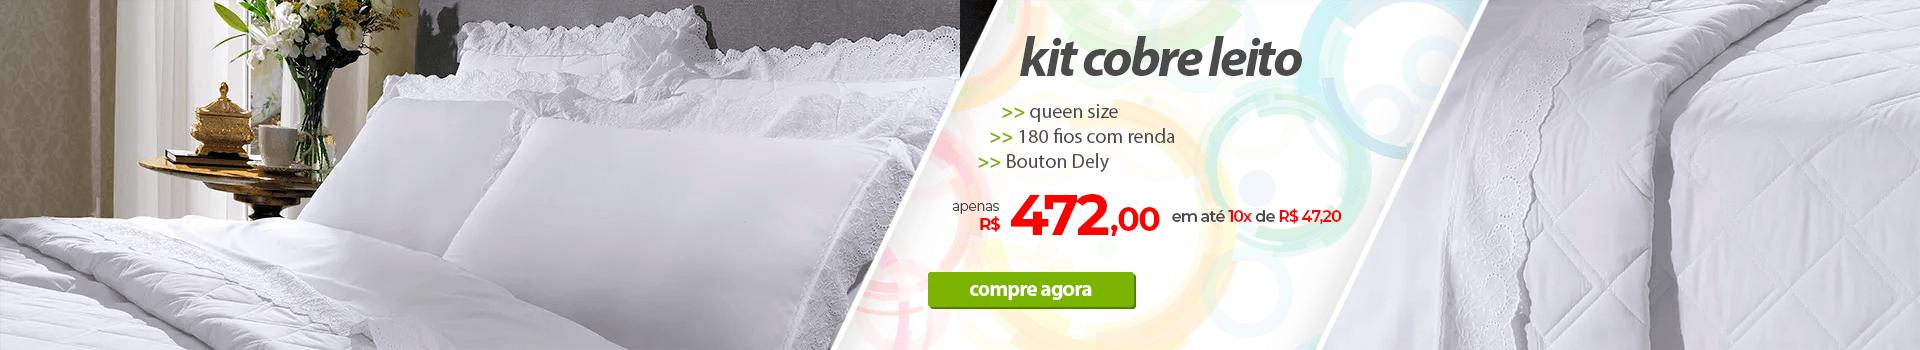 Kit Cobre Leito Queen Size 180 Fios Bouton Dely | Apenas R$472,00 | Loja Buettner | Compre Agora!